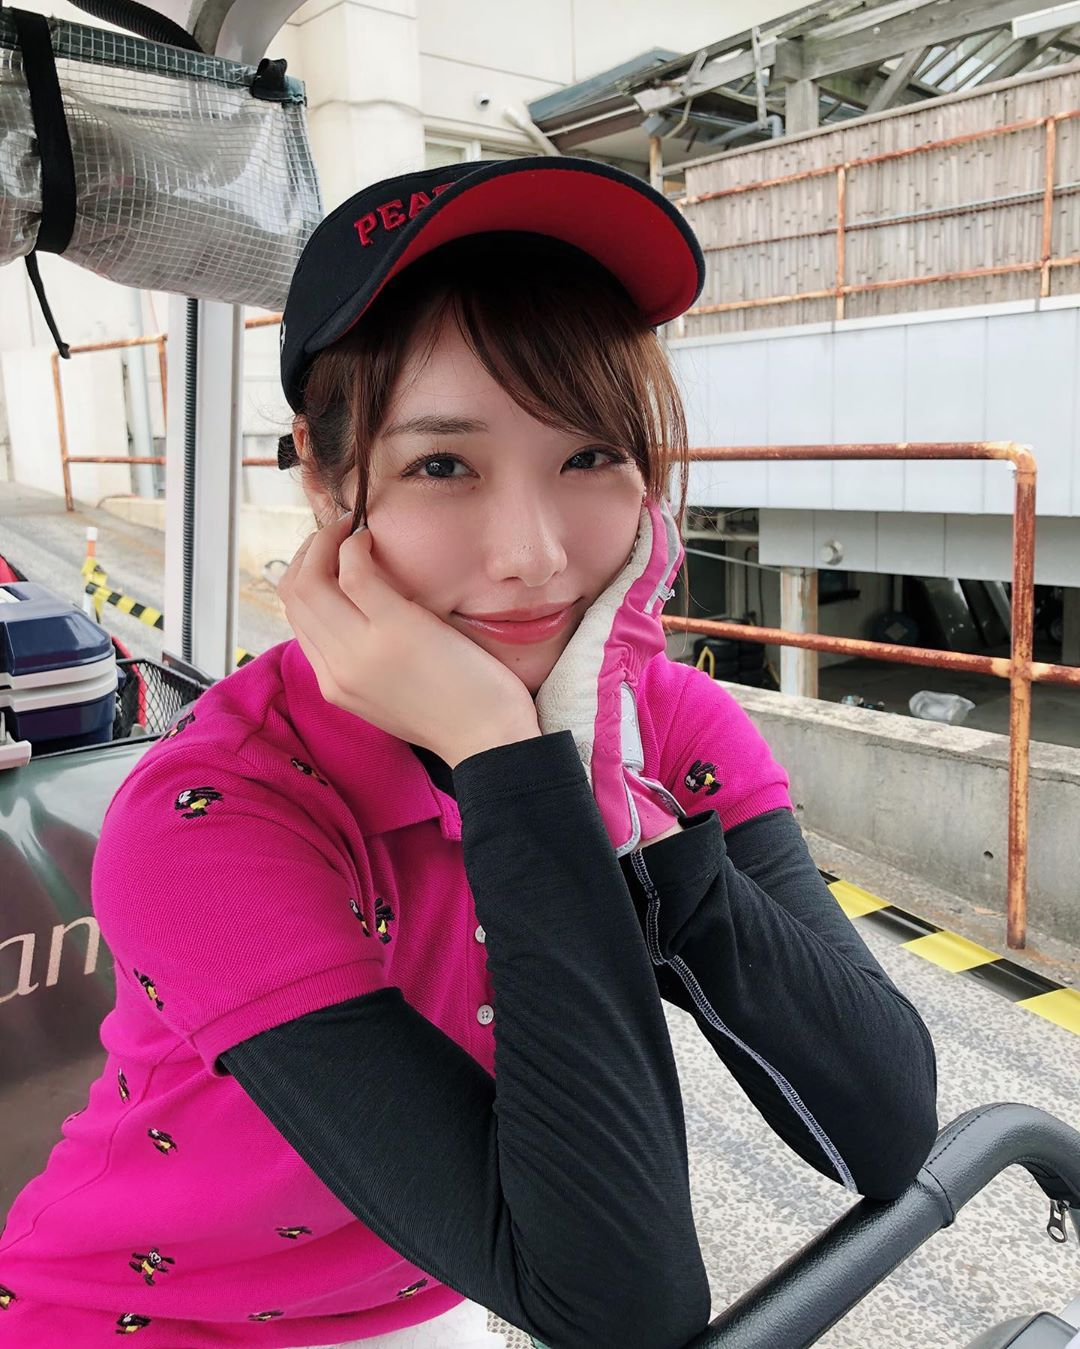 konno_anna284.jpg